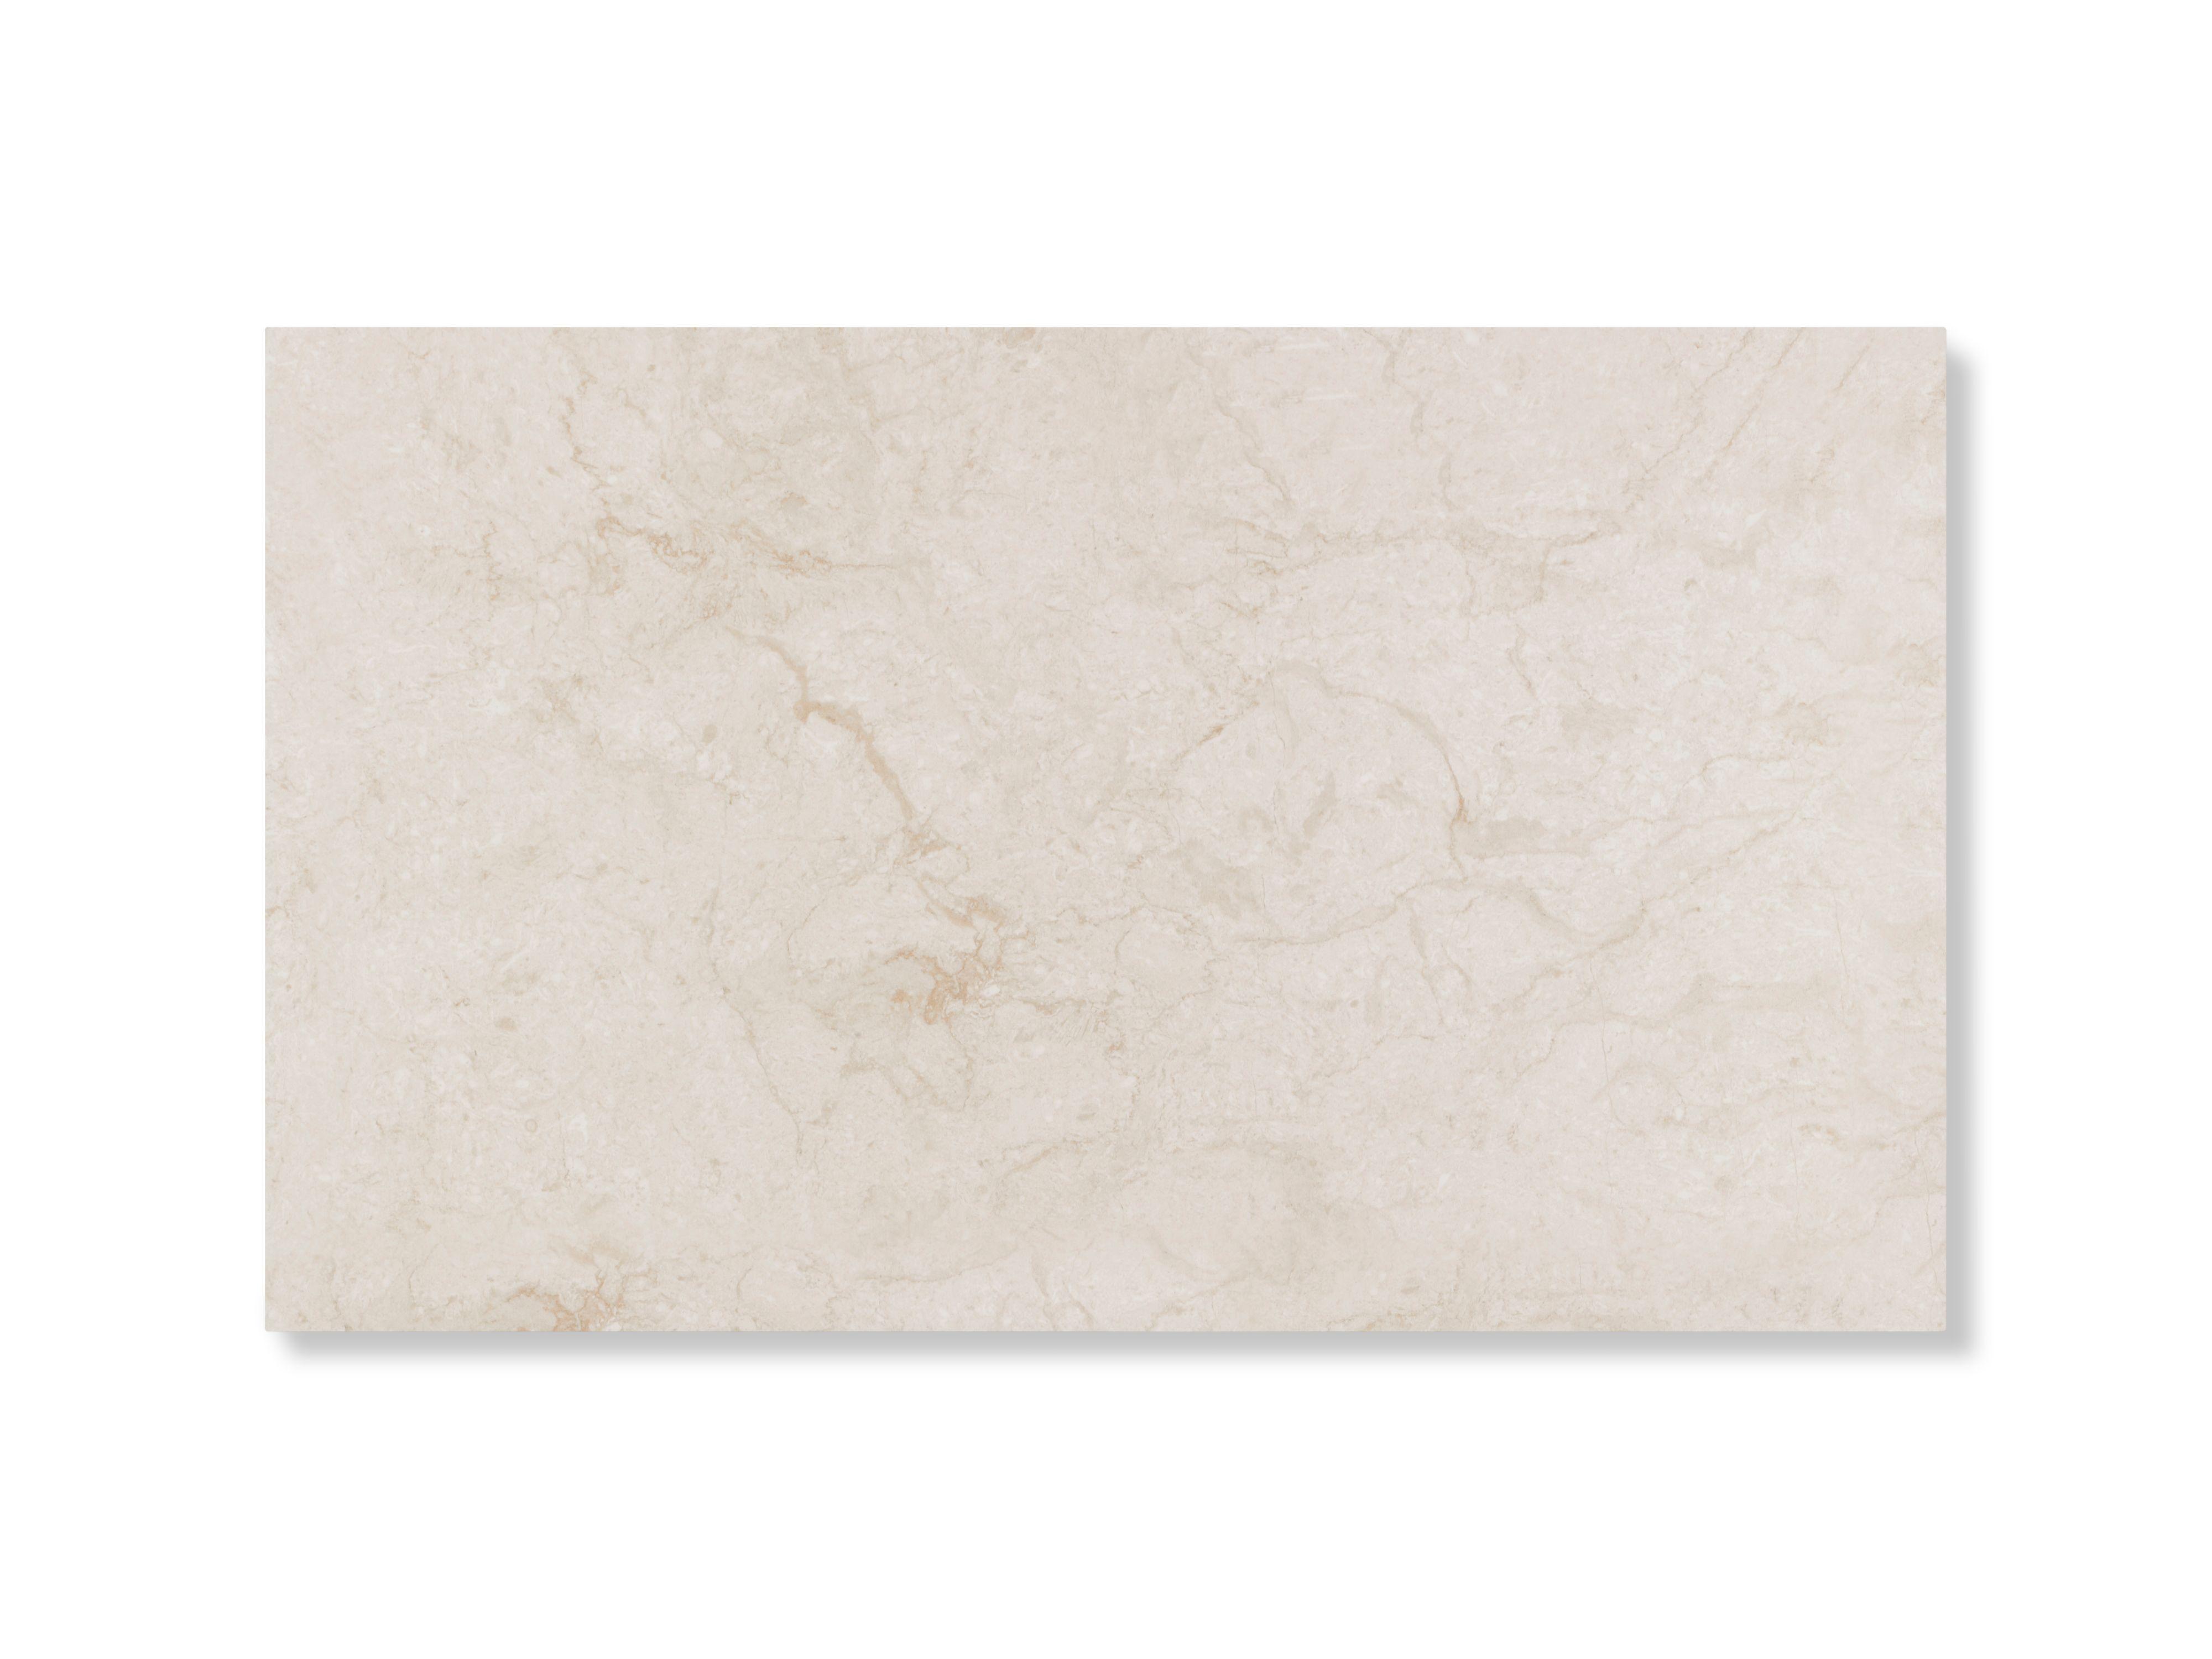 Hartford sand marble stone effect plain ceramic wall floor tile hartford marble sand stone effect plain ceramic wall floor tile pack of 6 dailygadgetfo Gallery